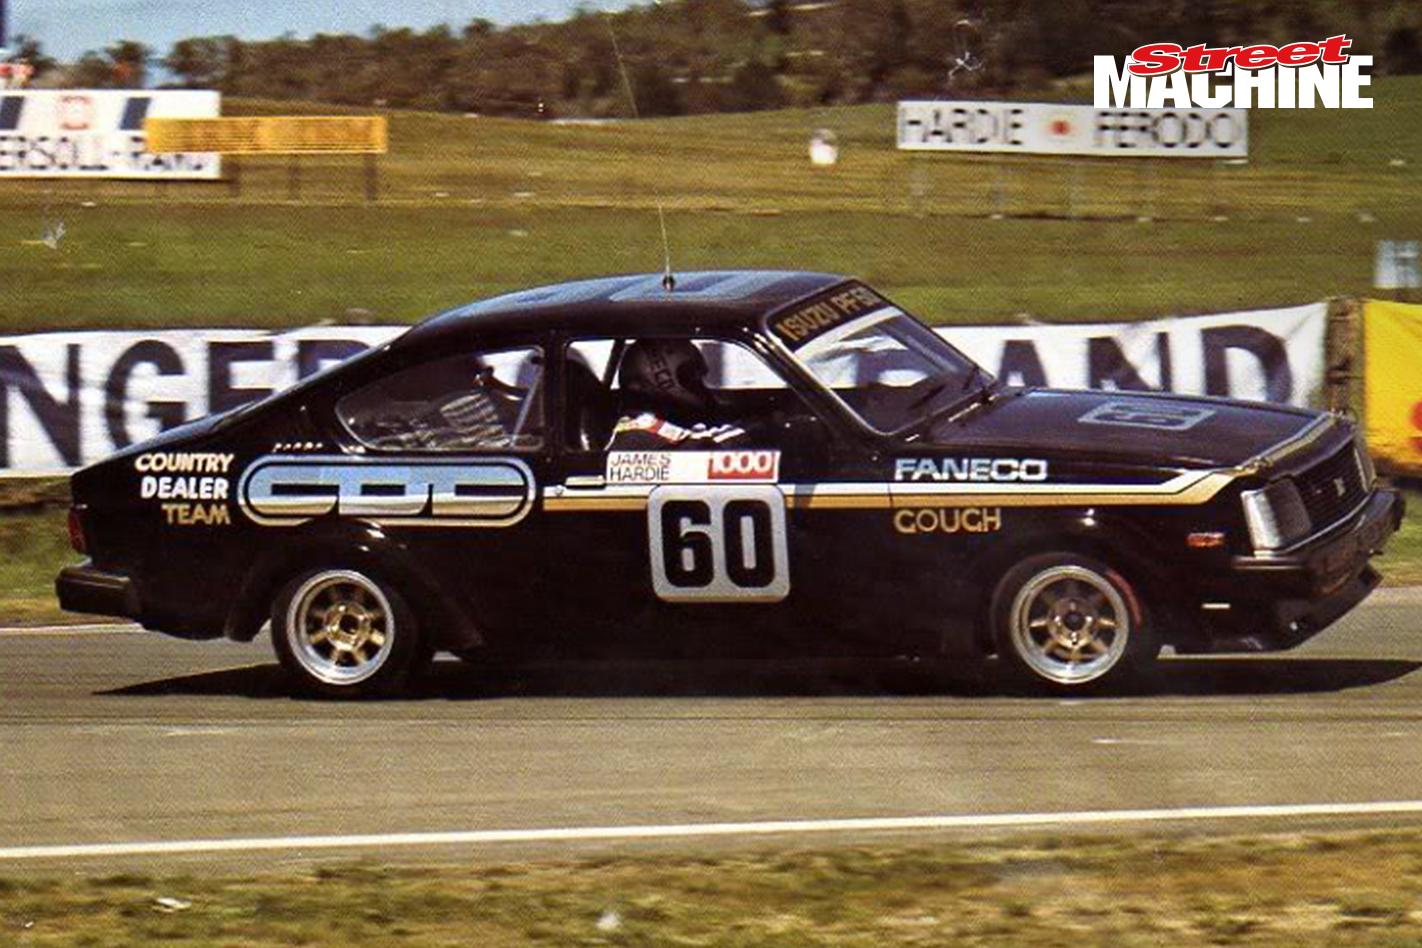 Holden Gemini Bathurst Coupe Nw